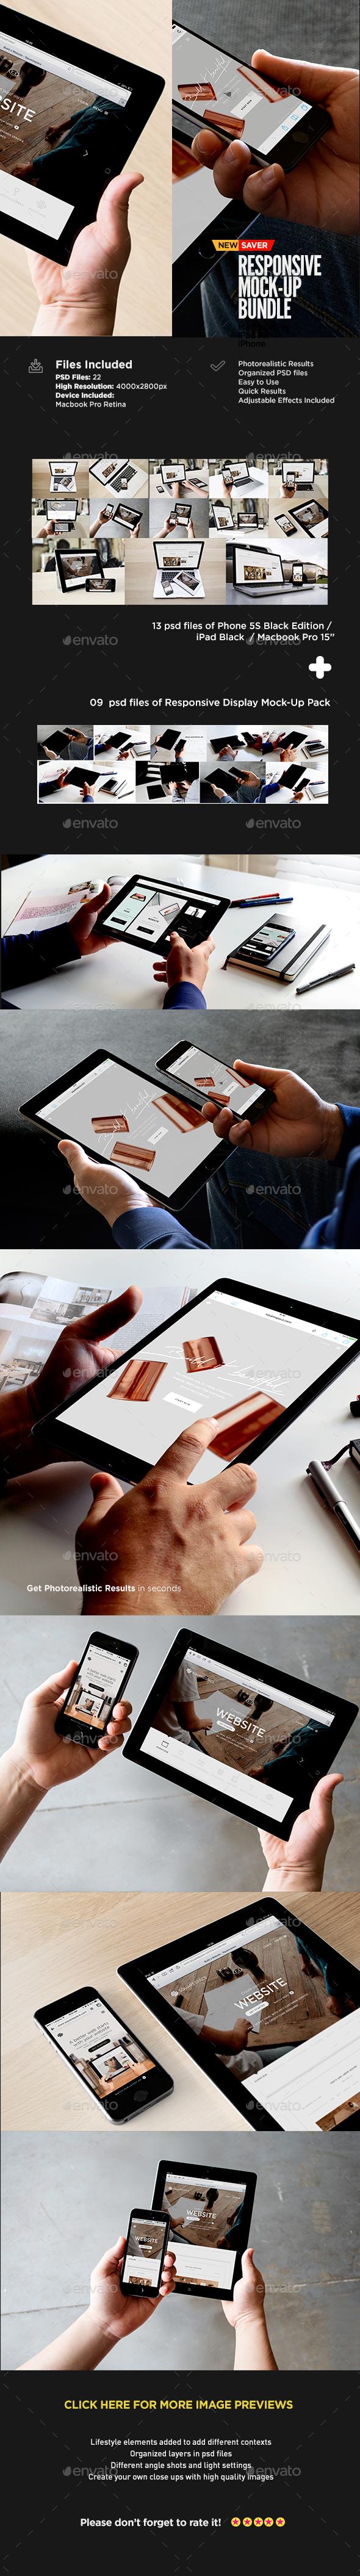 Responsive Web Design Mockup | Bundle Edition - Multiple Displays